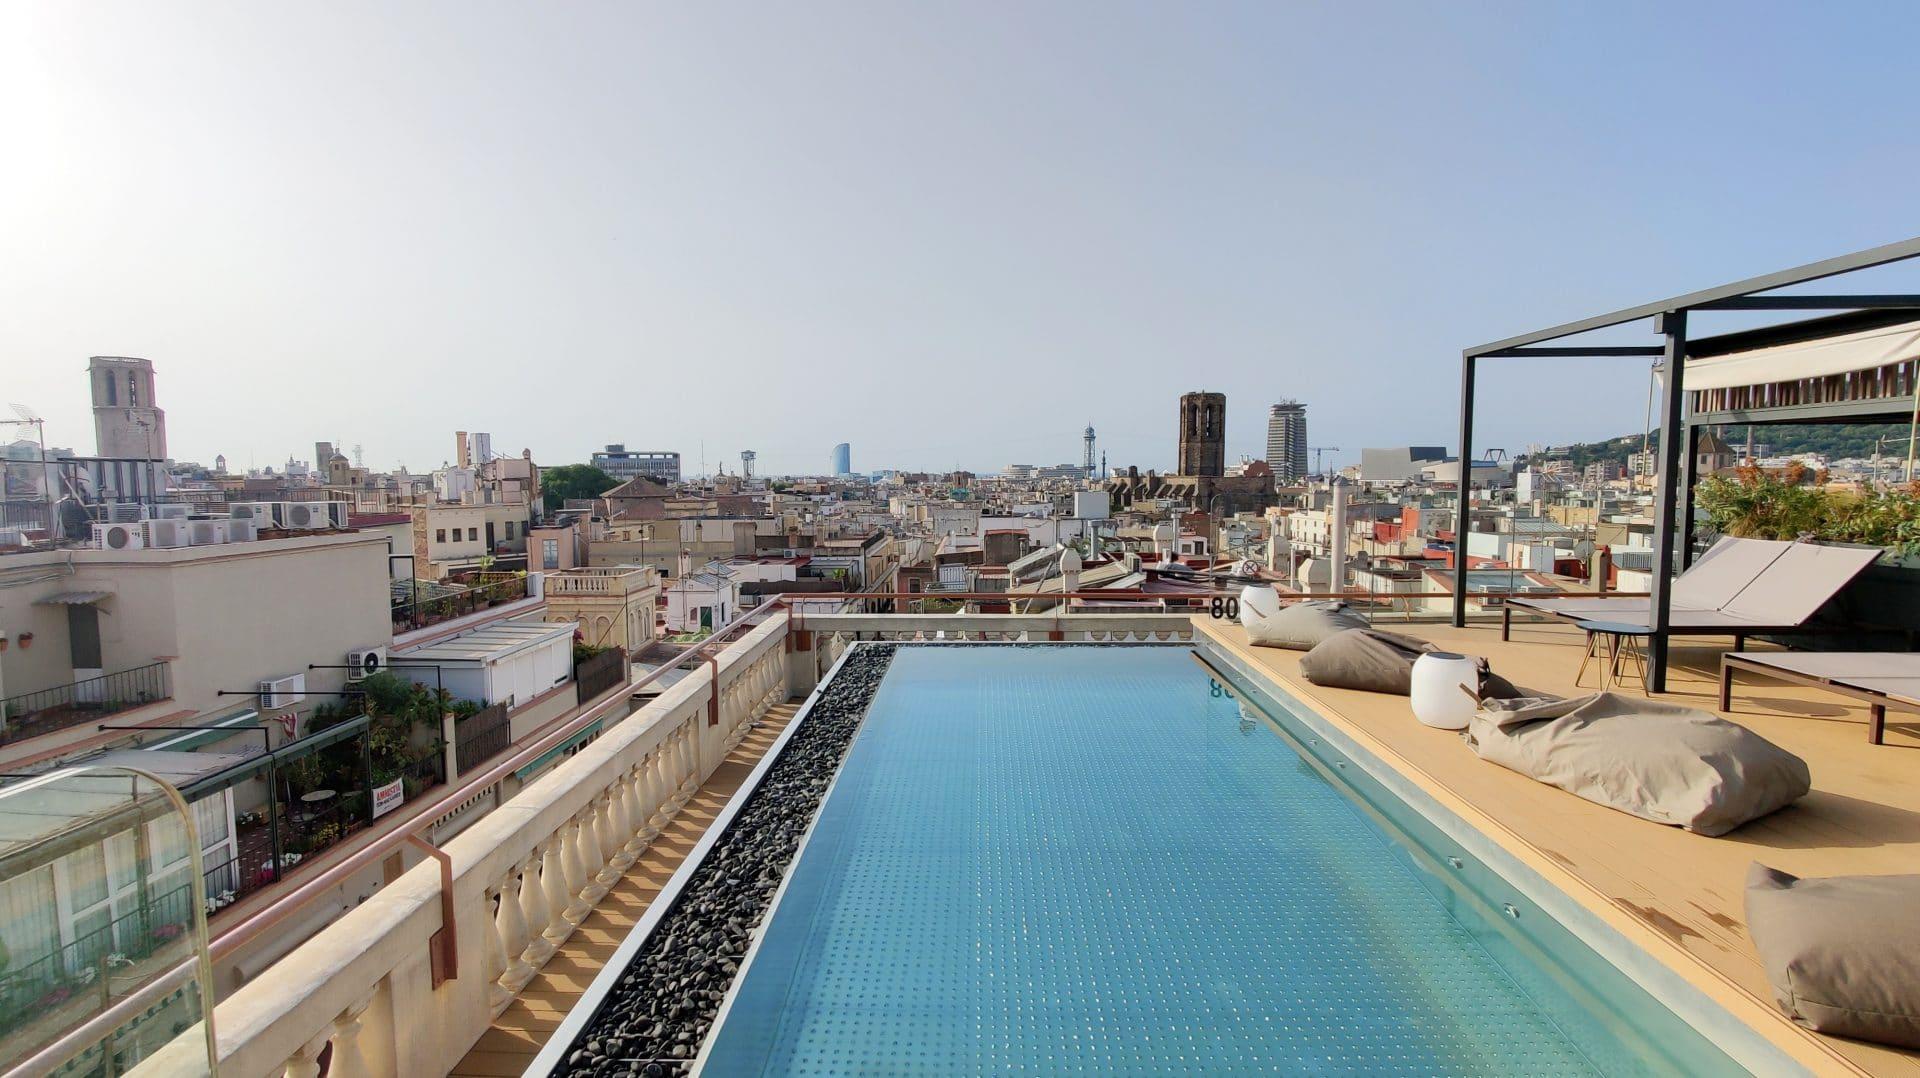 Kimpton Vividora Barcelona Rooftop Pool 2